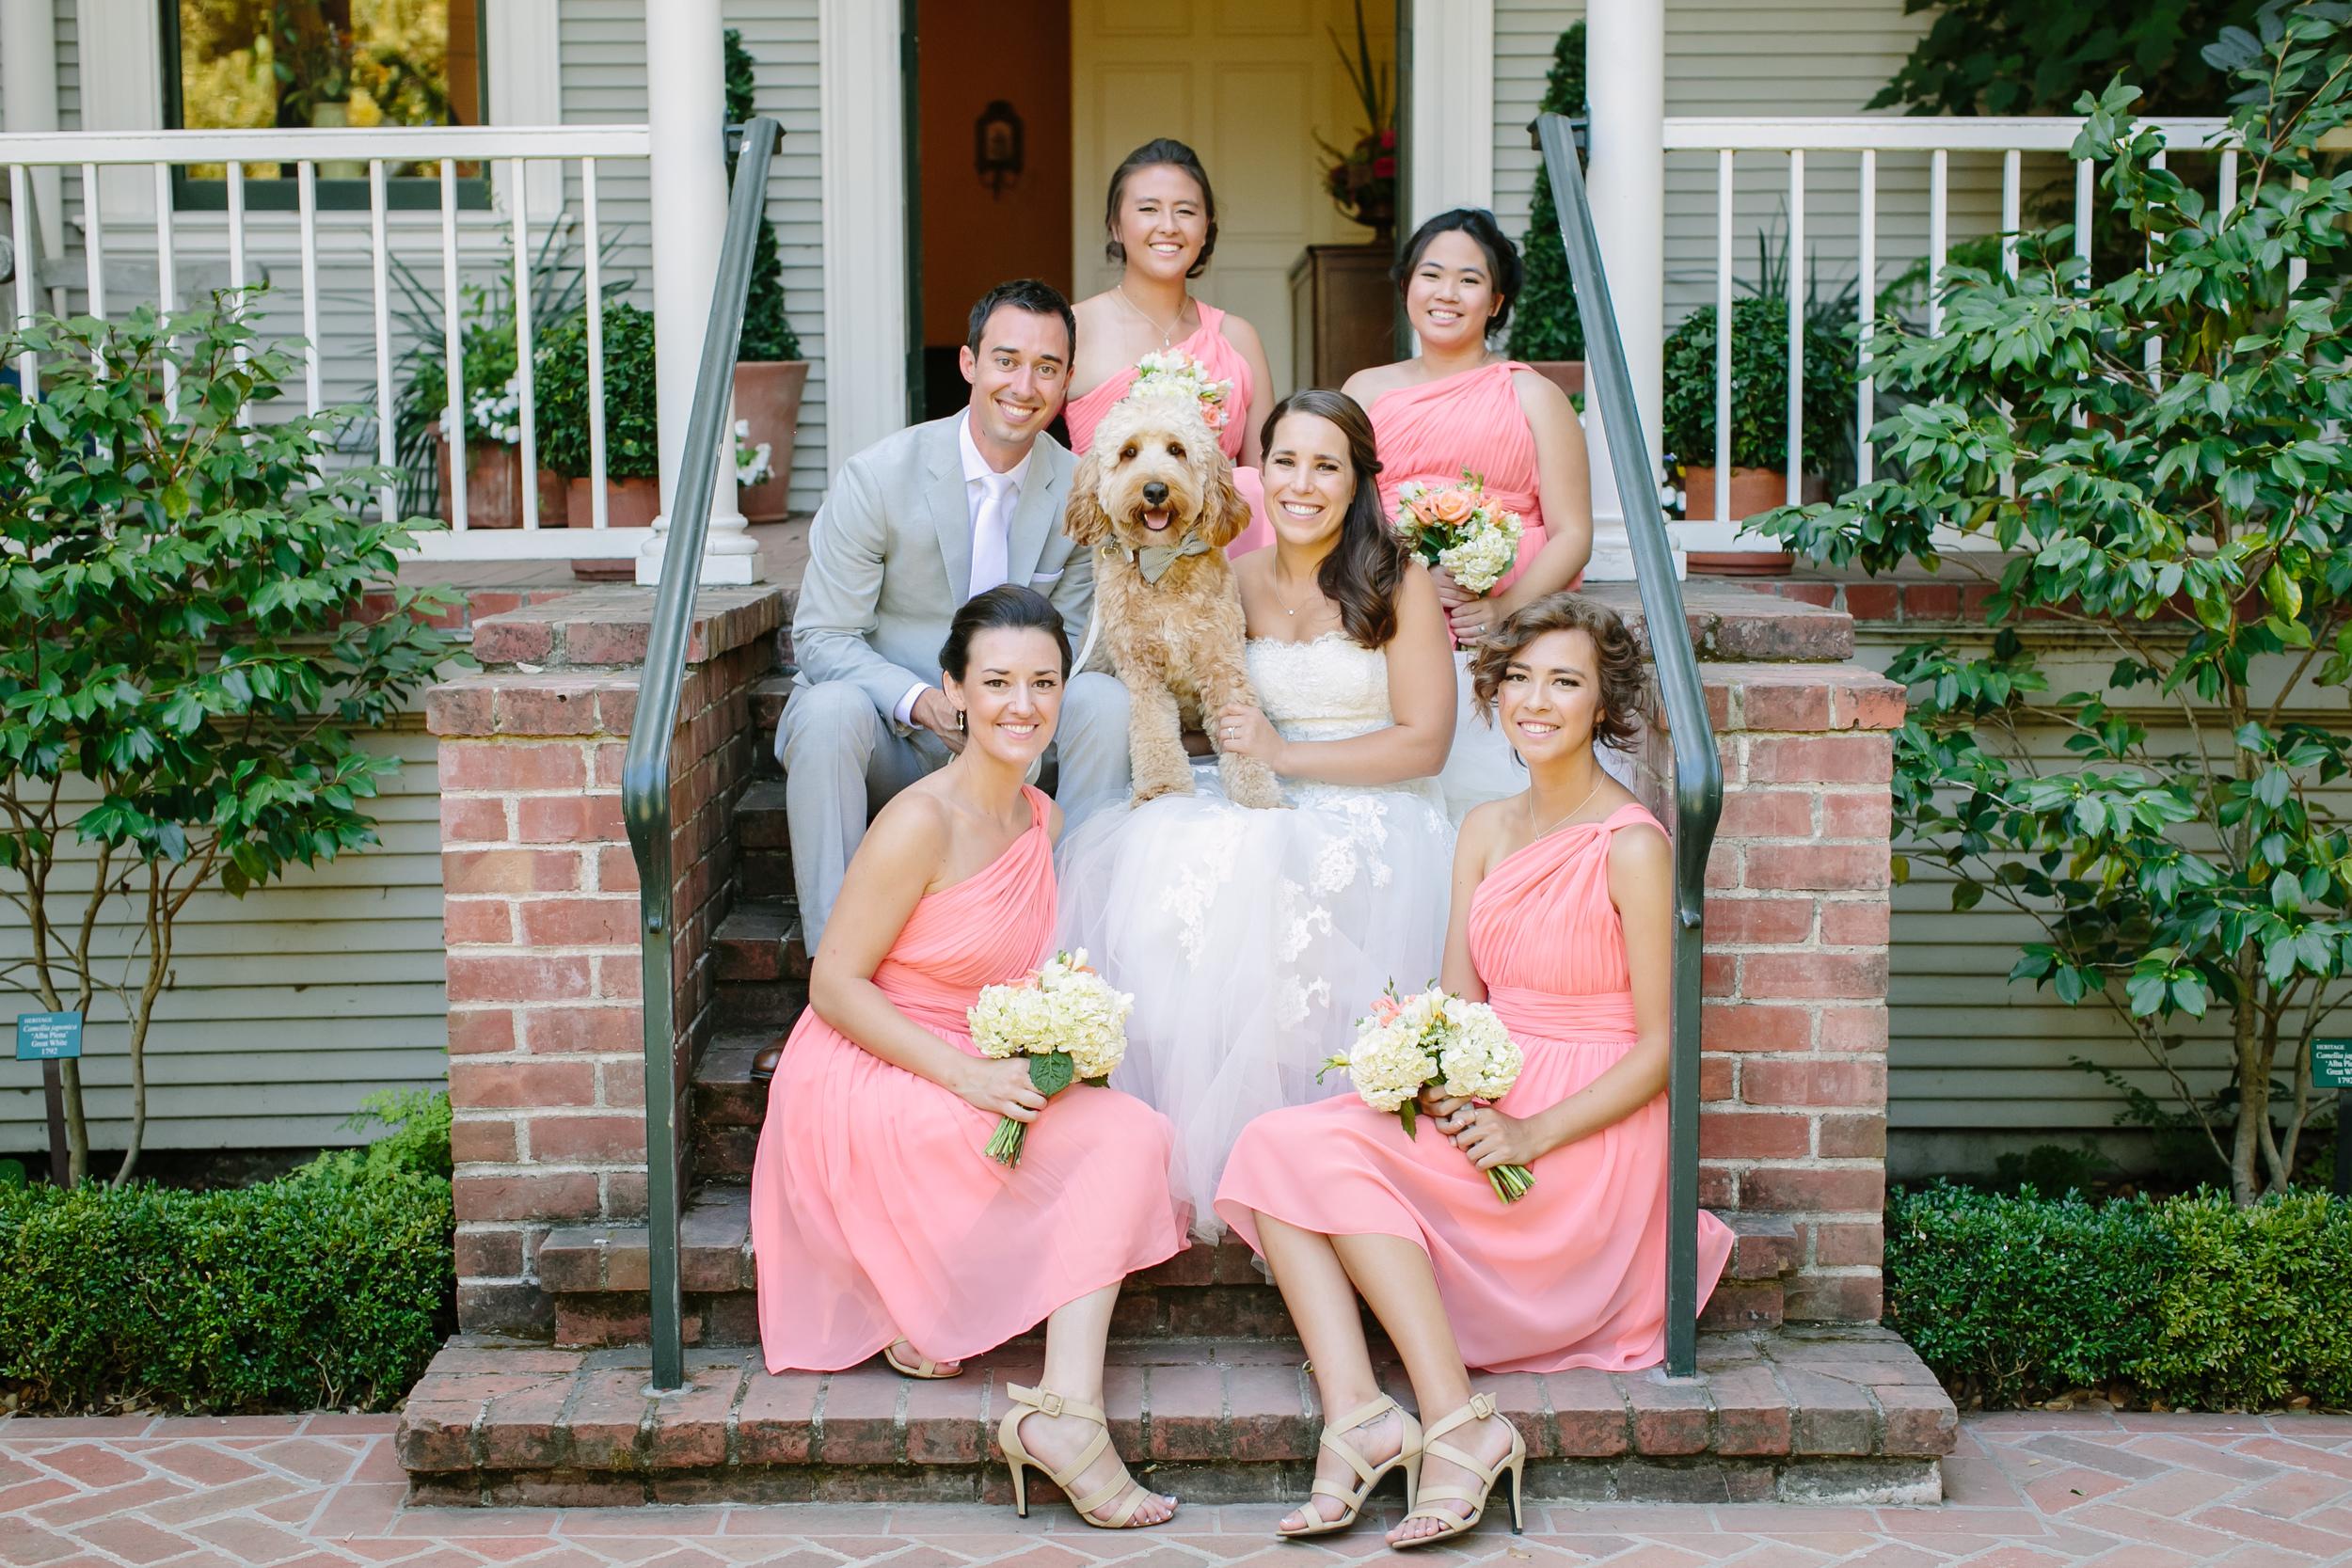 03KR-Wedding-Teasers-Indu-Huynh-Photography.jpg